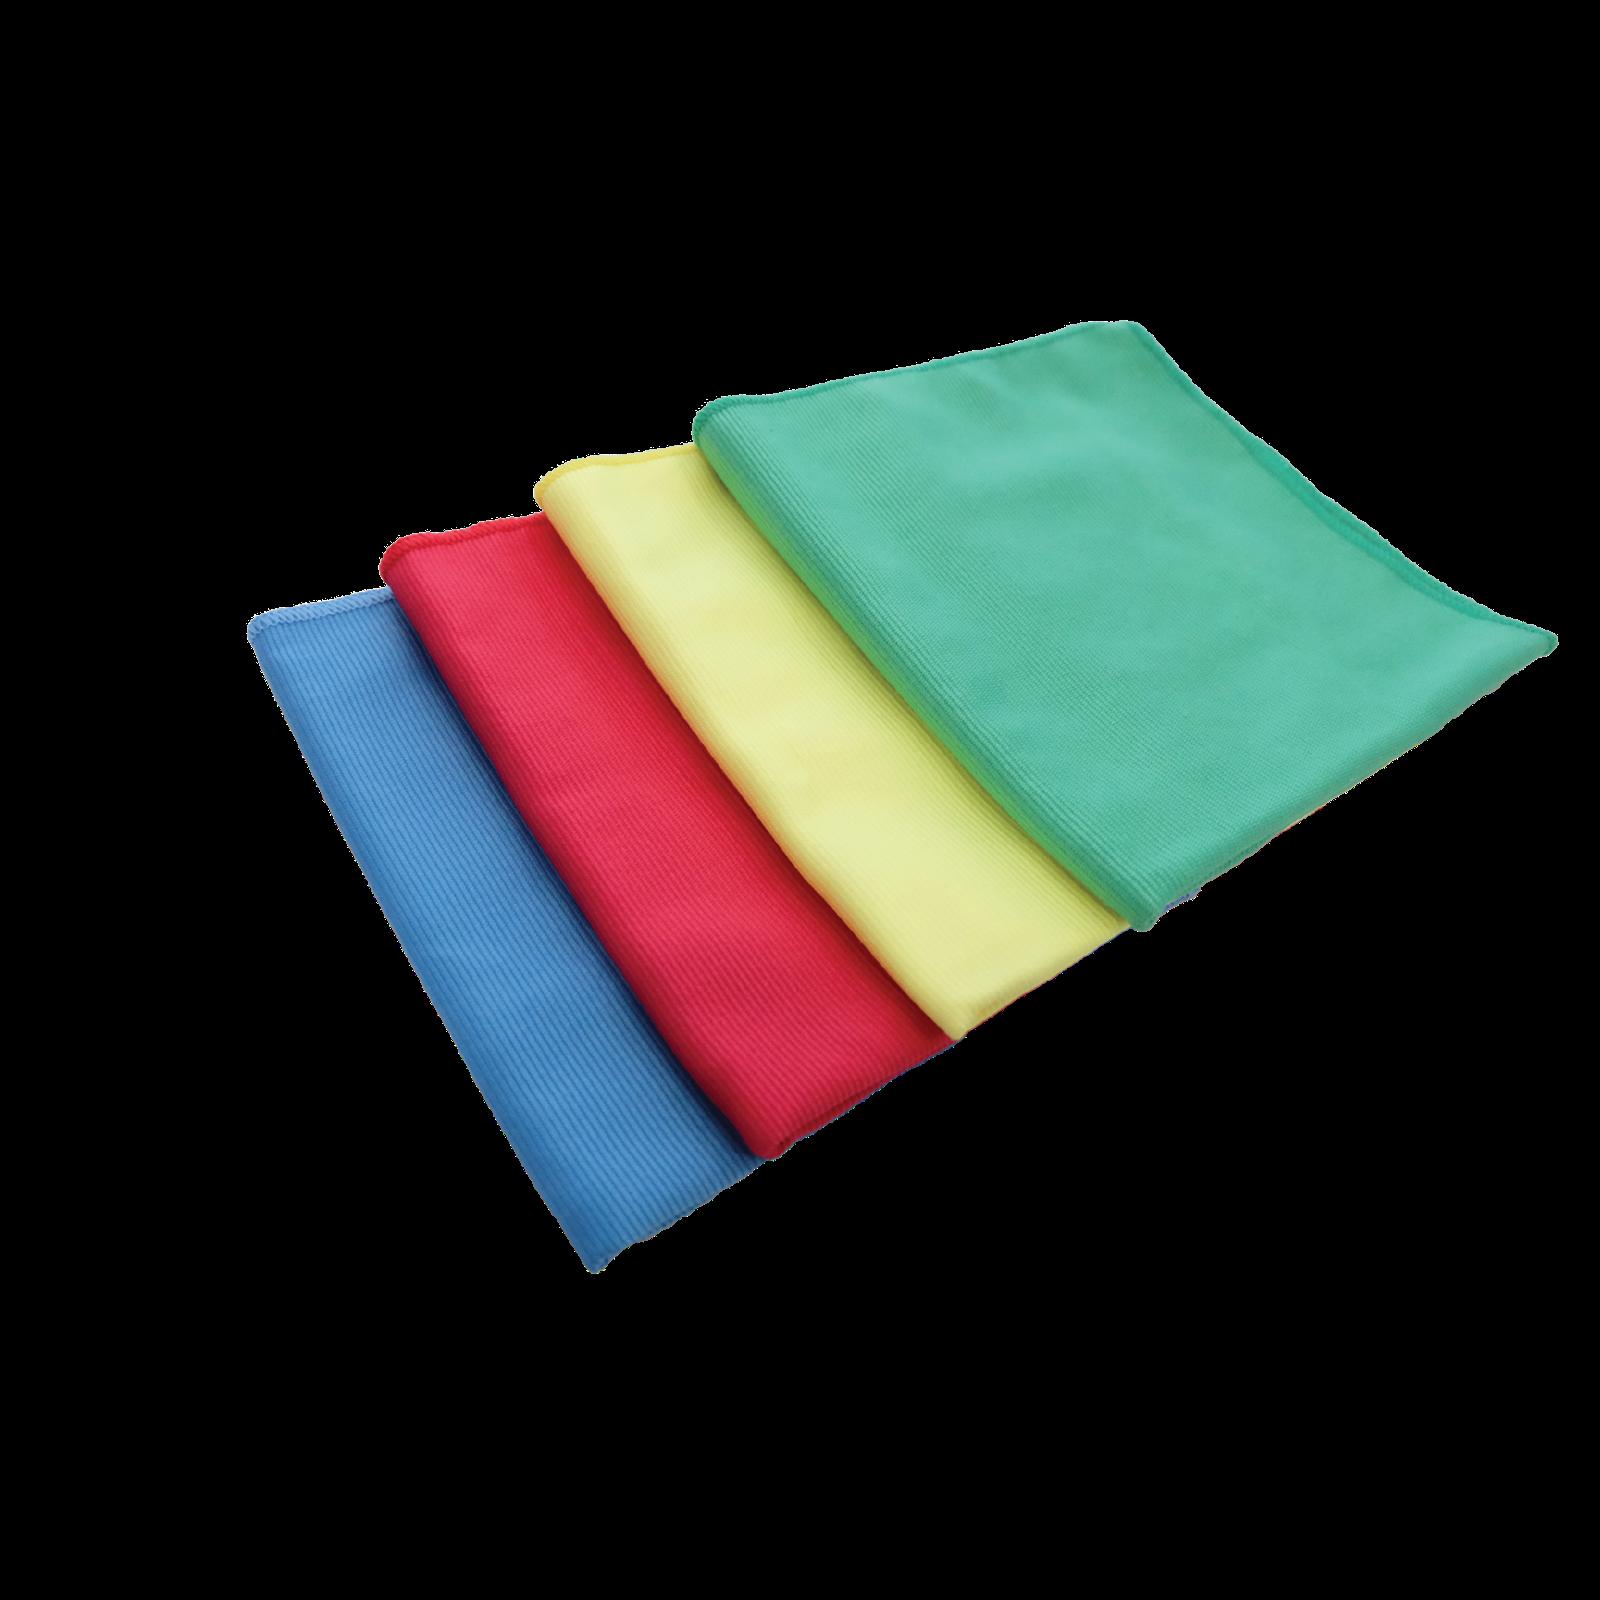 Microfiber Gun Cleaning Cloth: Multipurpose Anti Bacterial Microfiber Cleaning Cloth